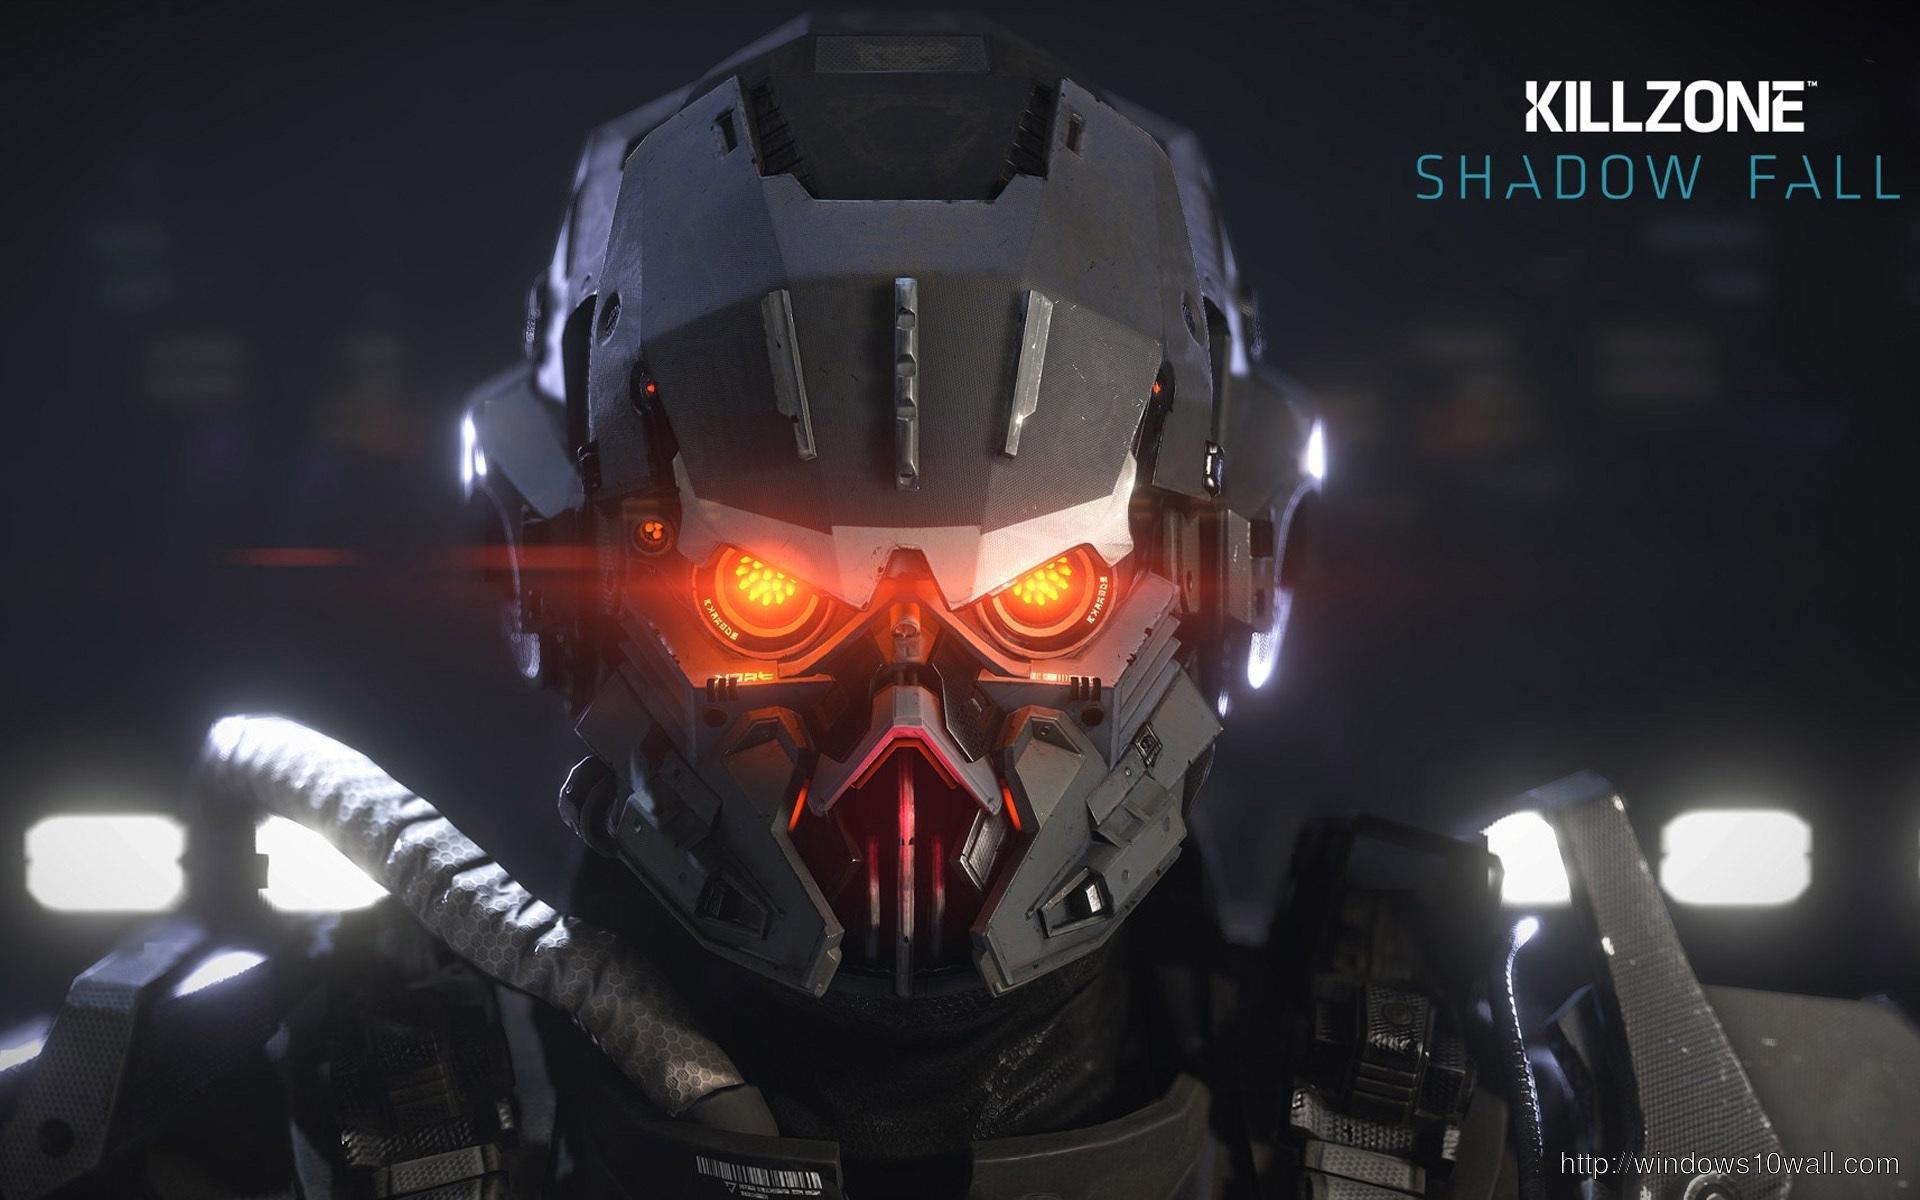 killzone-shadow-fall-background-wallpaper